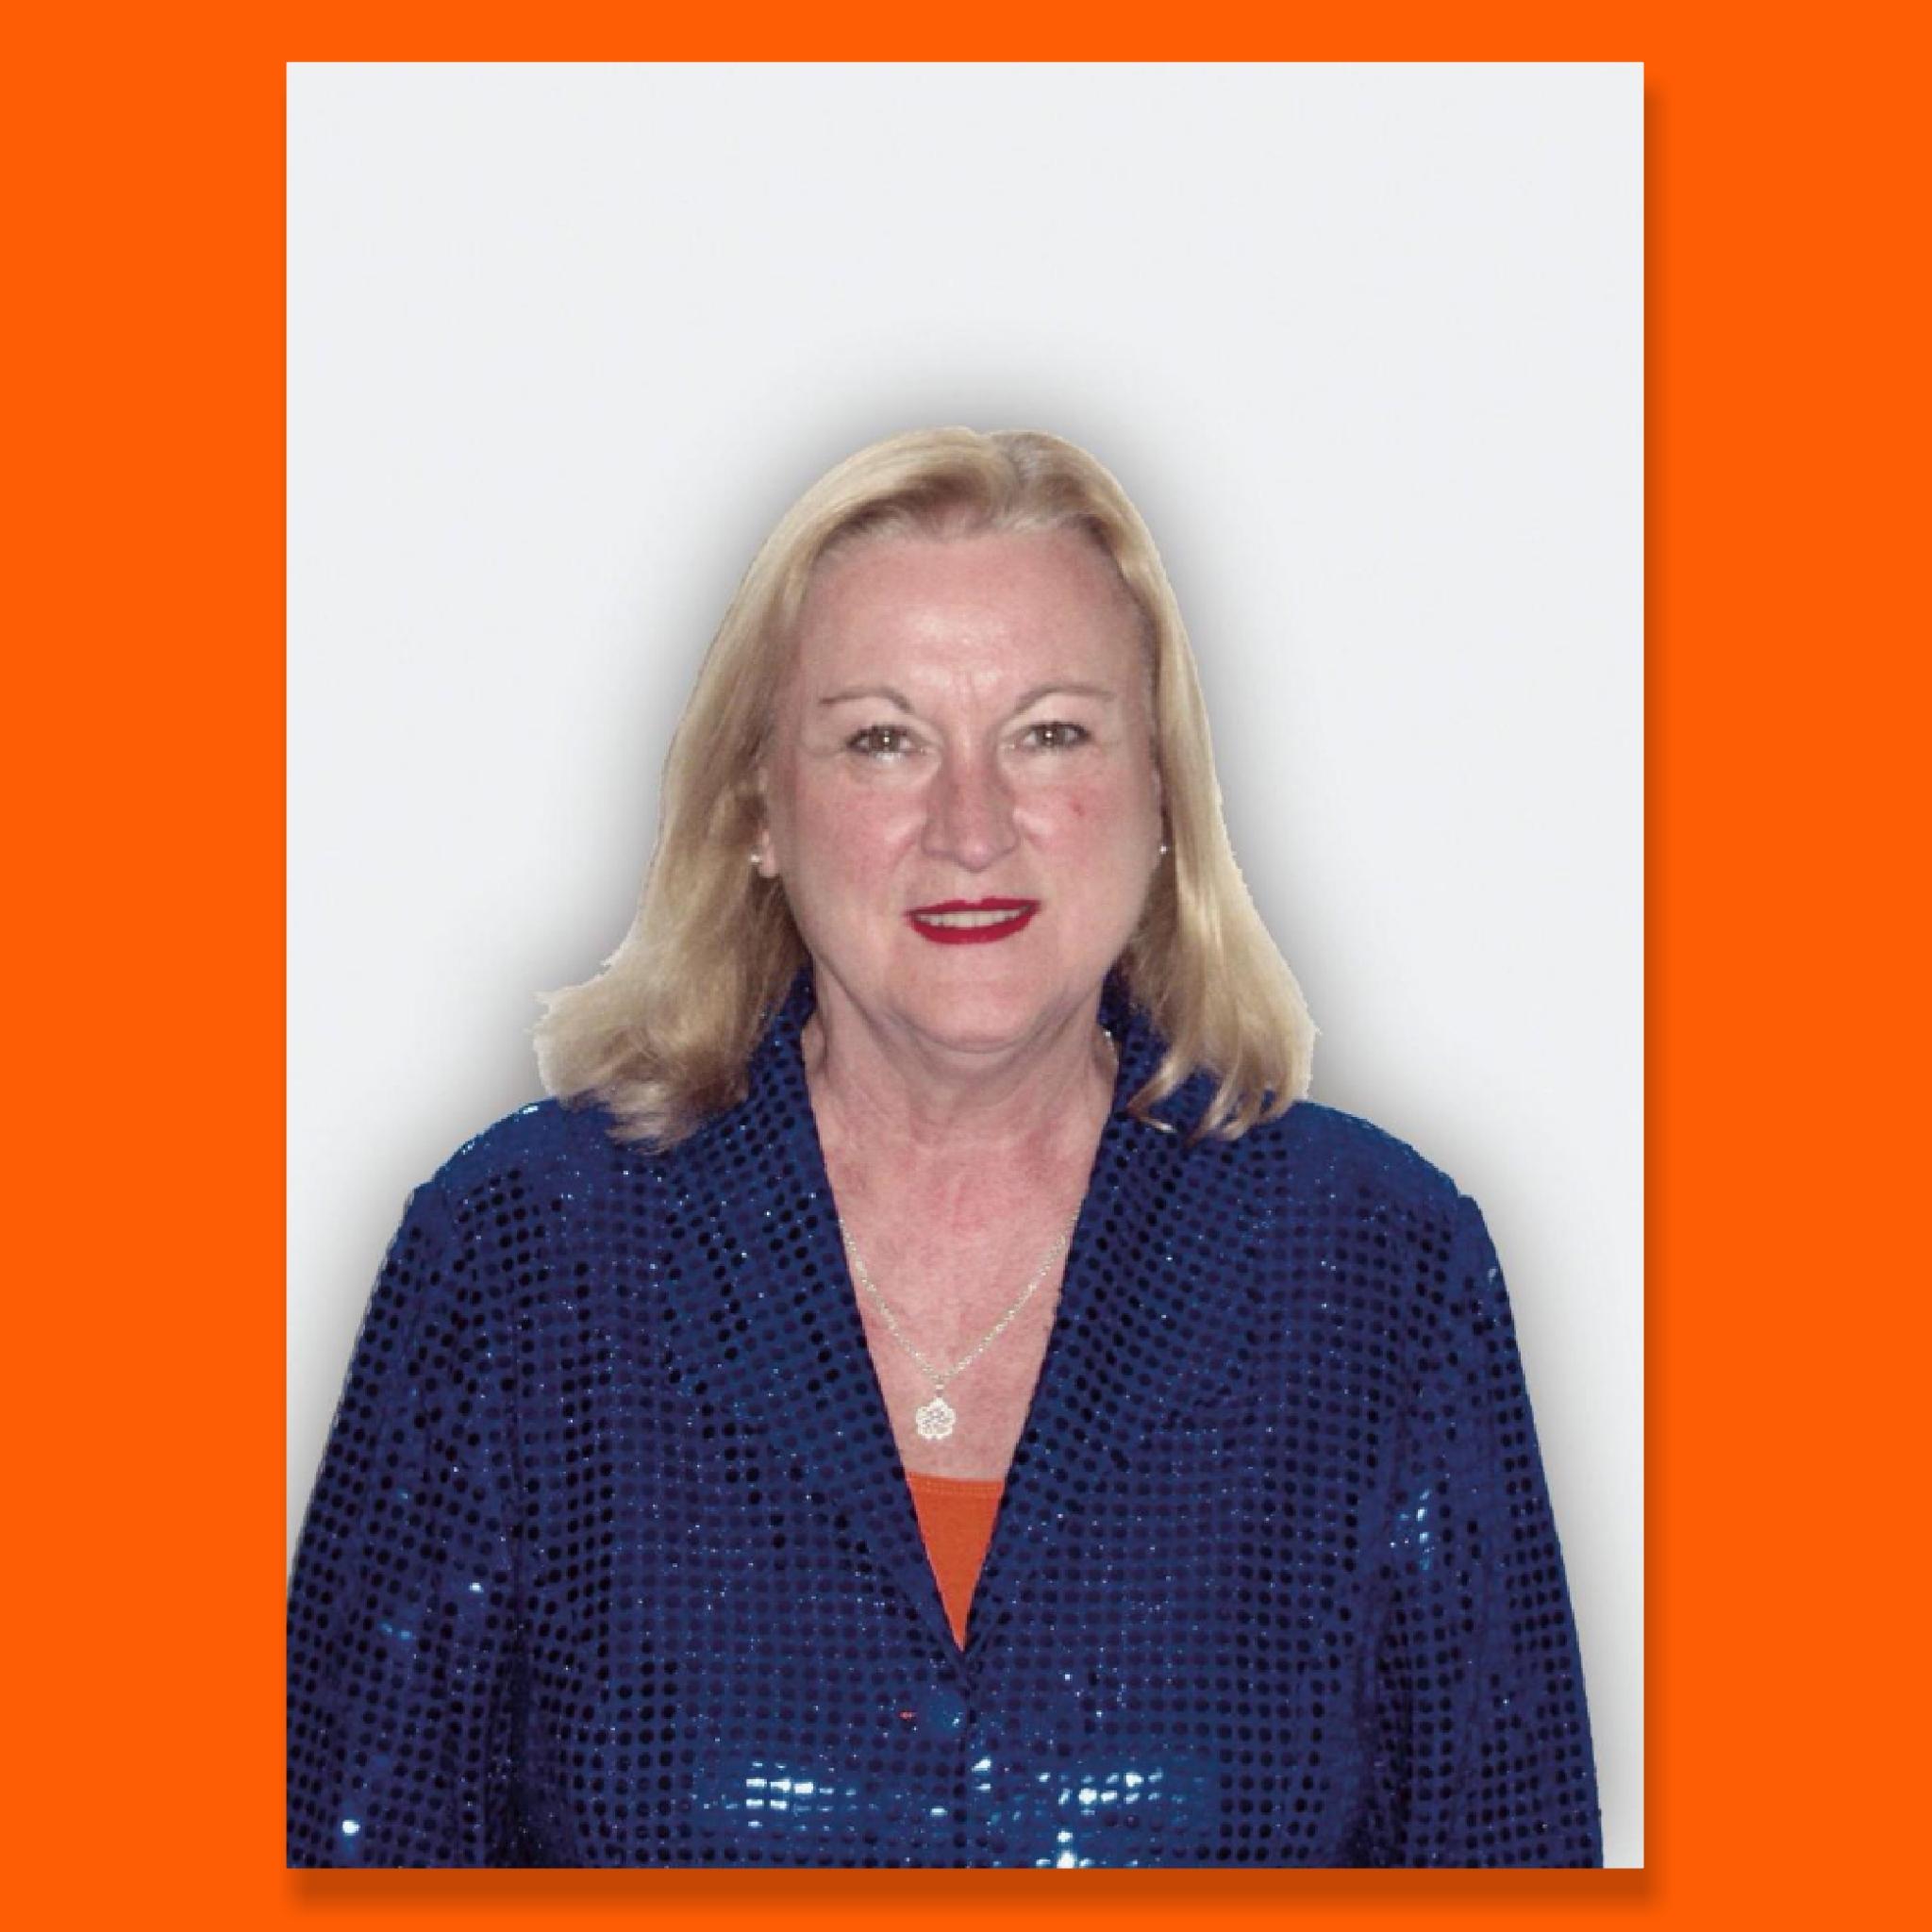 Barbara Aledter